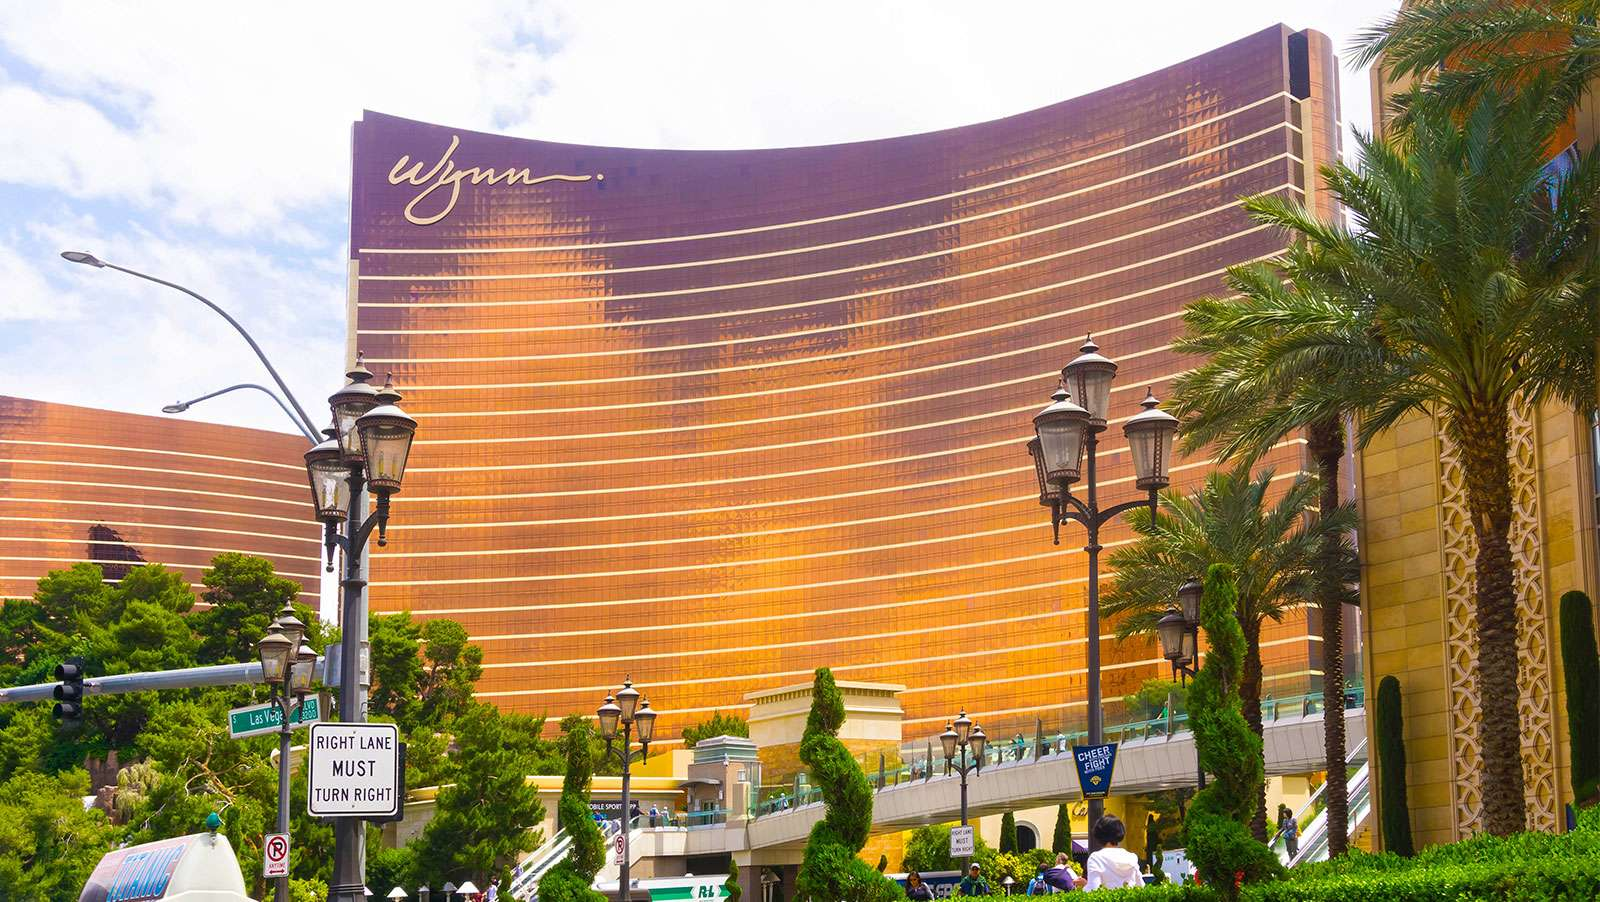 Wynn Resorts, BetBull ink US sports betting partnership